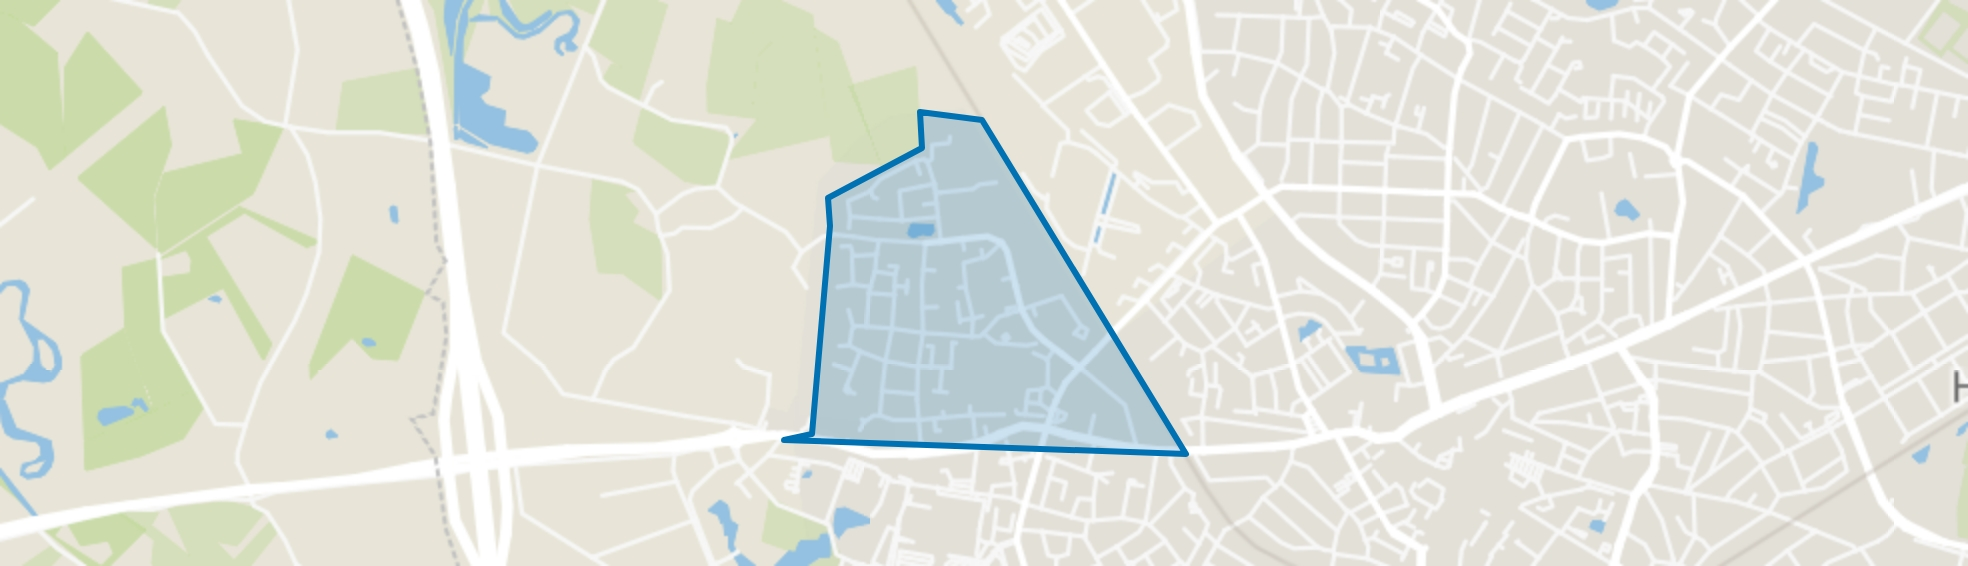 Woolder Es, Hengelo (OV) map